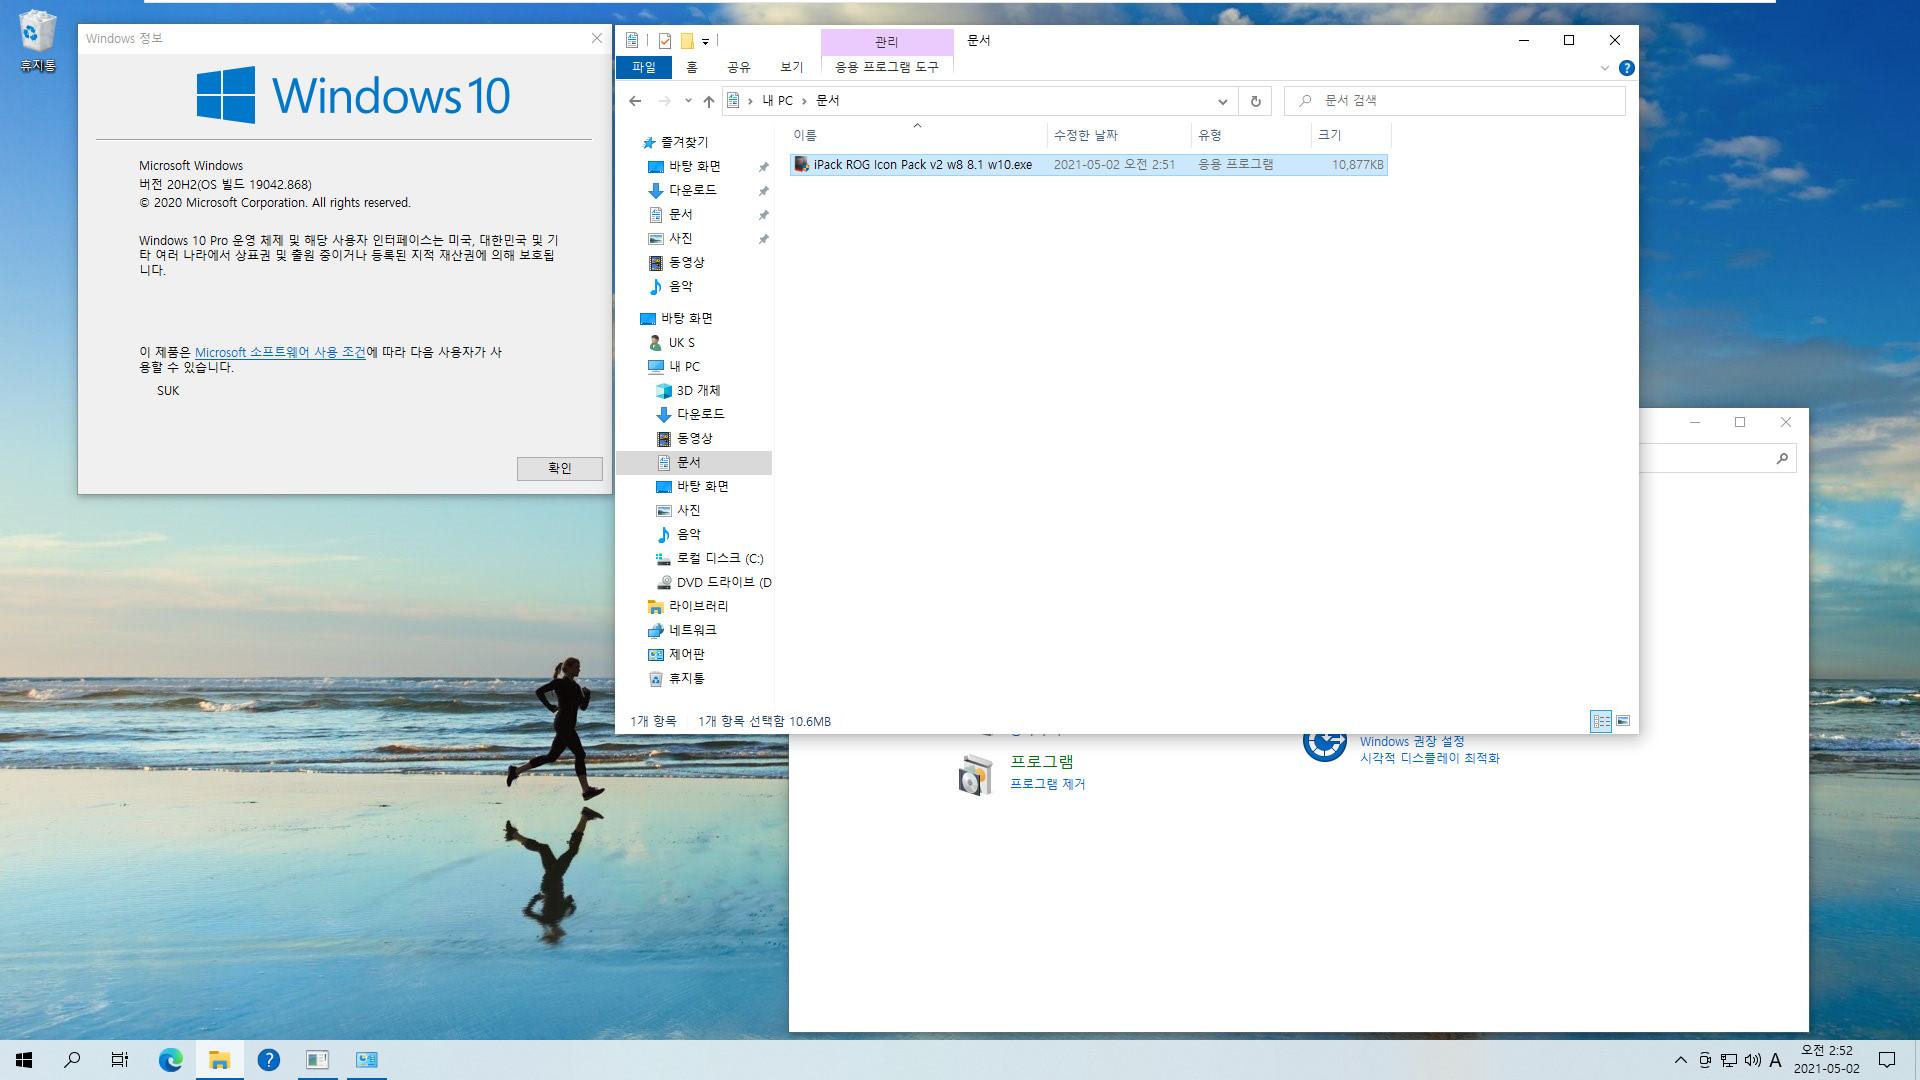 imageres.dll적용 테스트 - Windows 10 ROG 아이콘팩으로 설치해도 제어판이 사용자 계정만 변경되네요 2021-05-02_025232.jpg